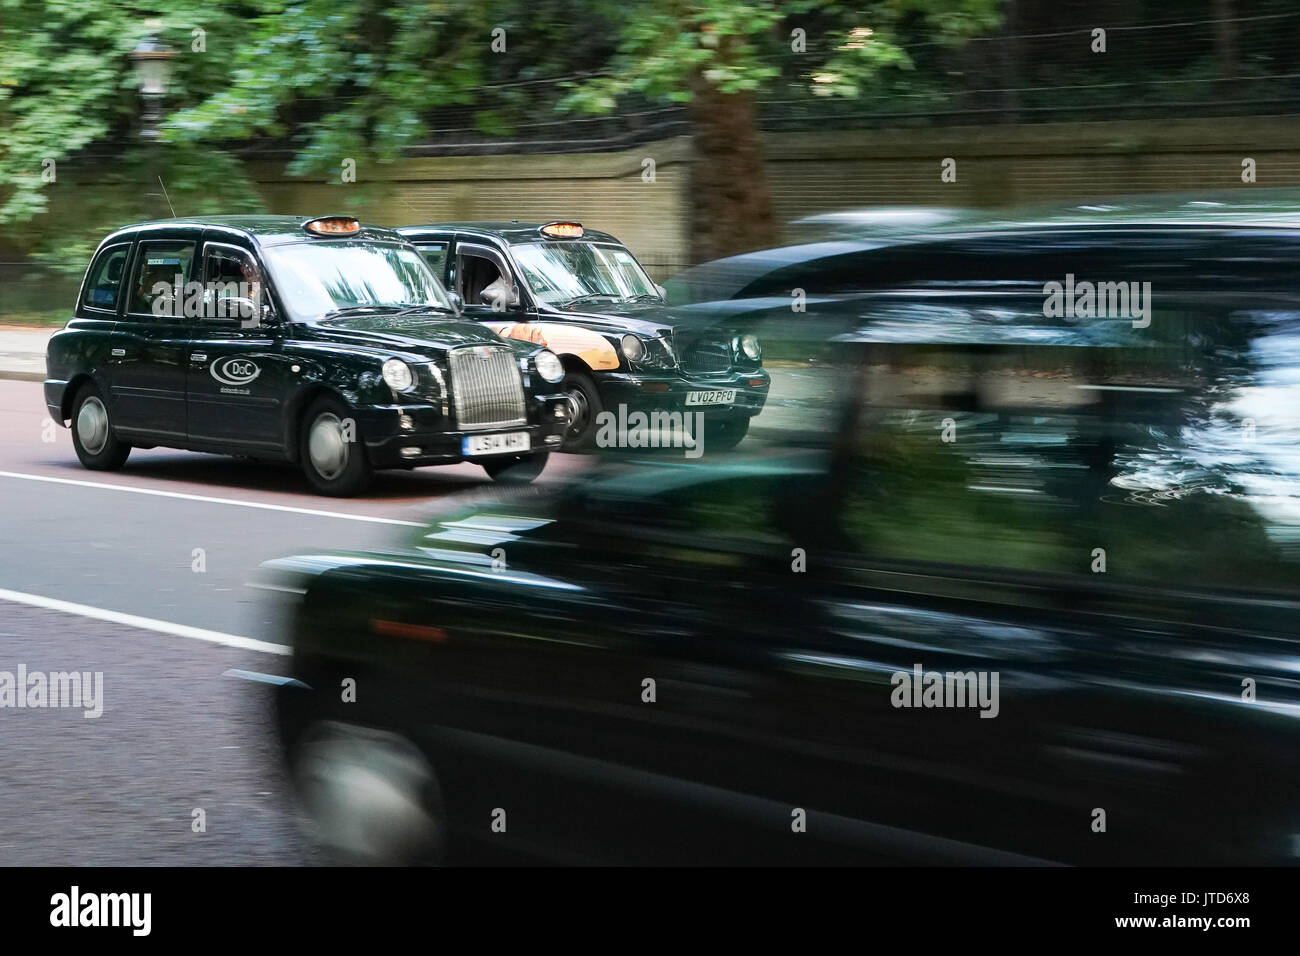 Black speed dating london